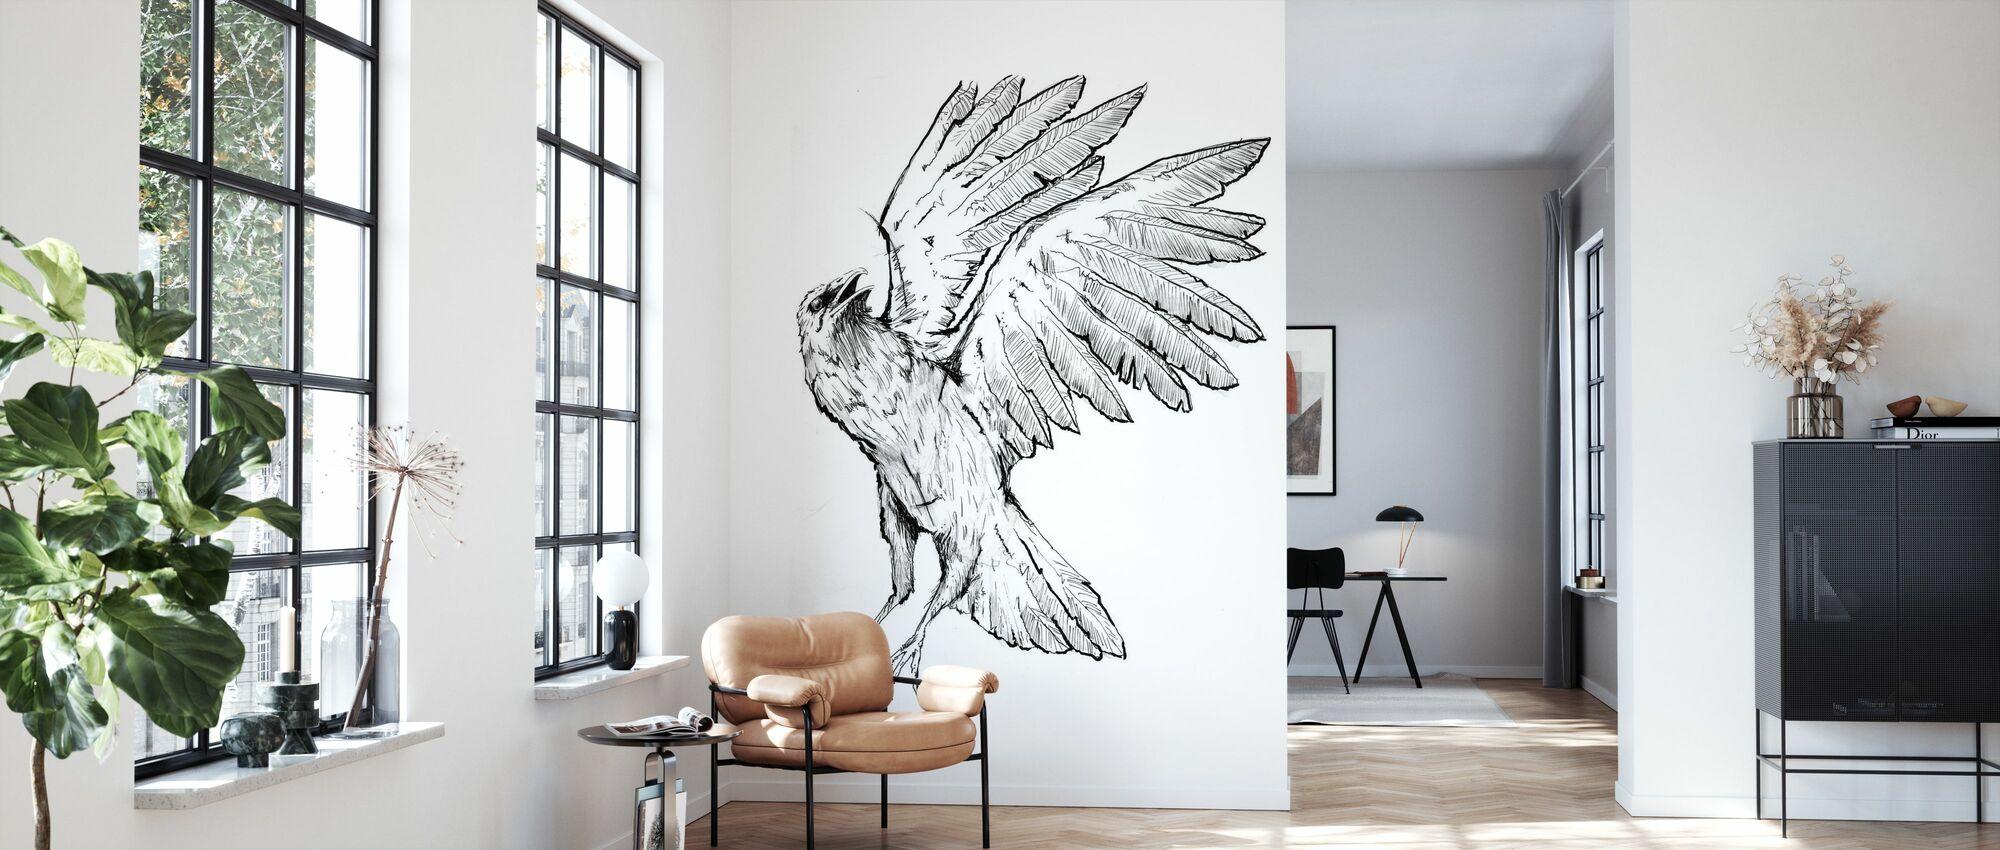 Crow - Wallpaper - Living Room